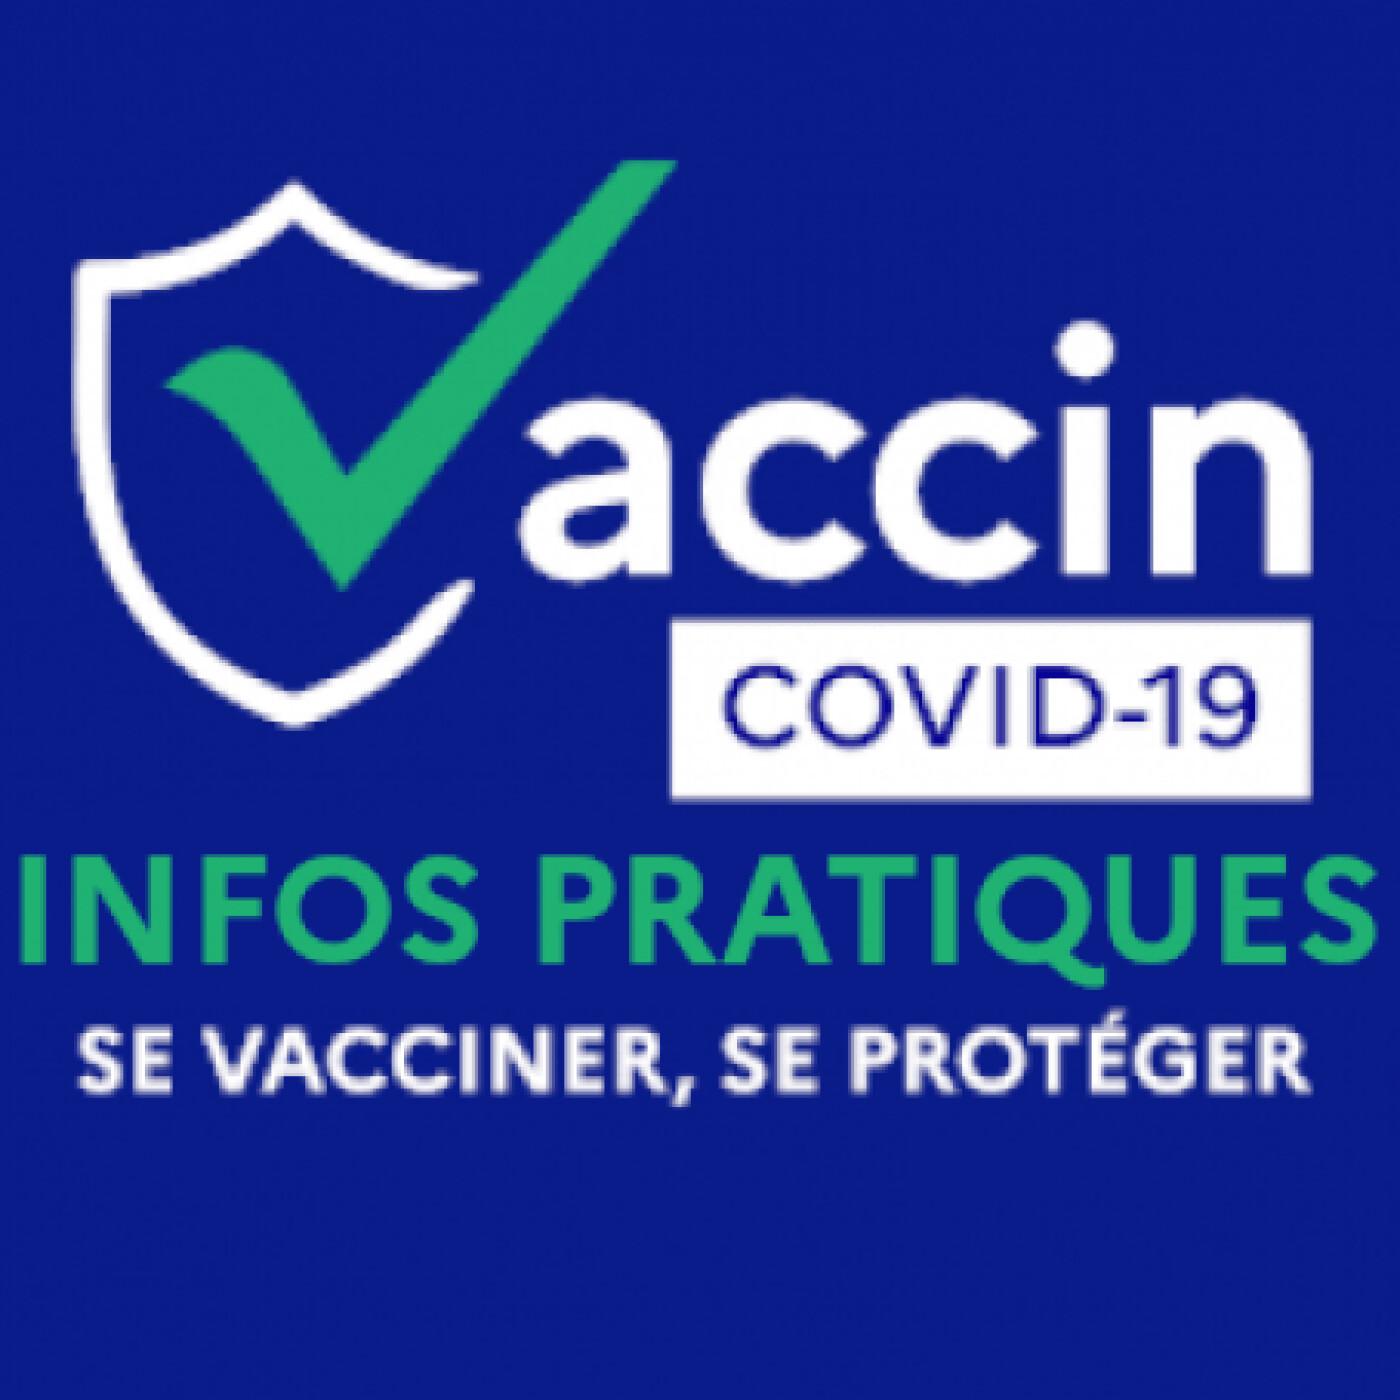 Eric, virologue à Boston, parle de l'avenir des vaccins - 10 05 2021 - StereoChic Radio